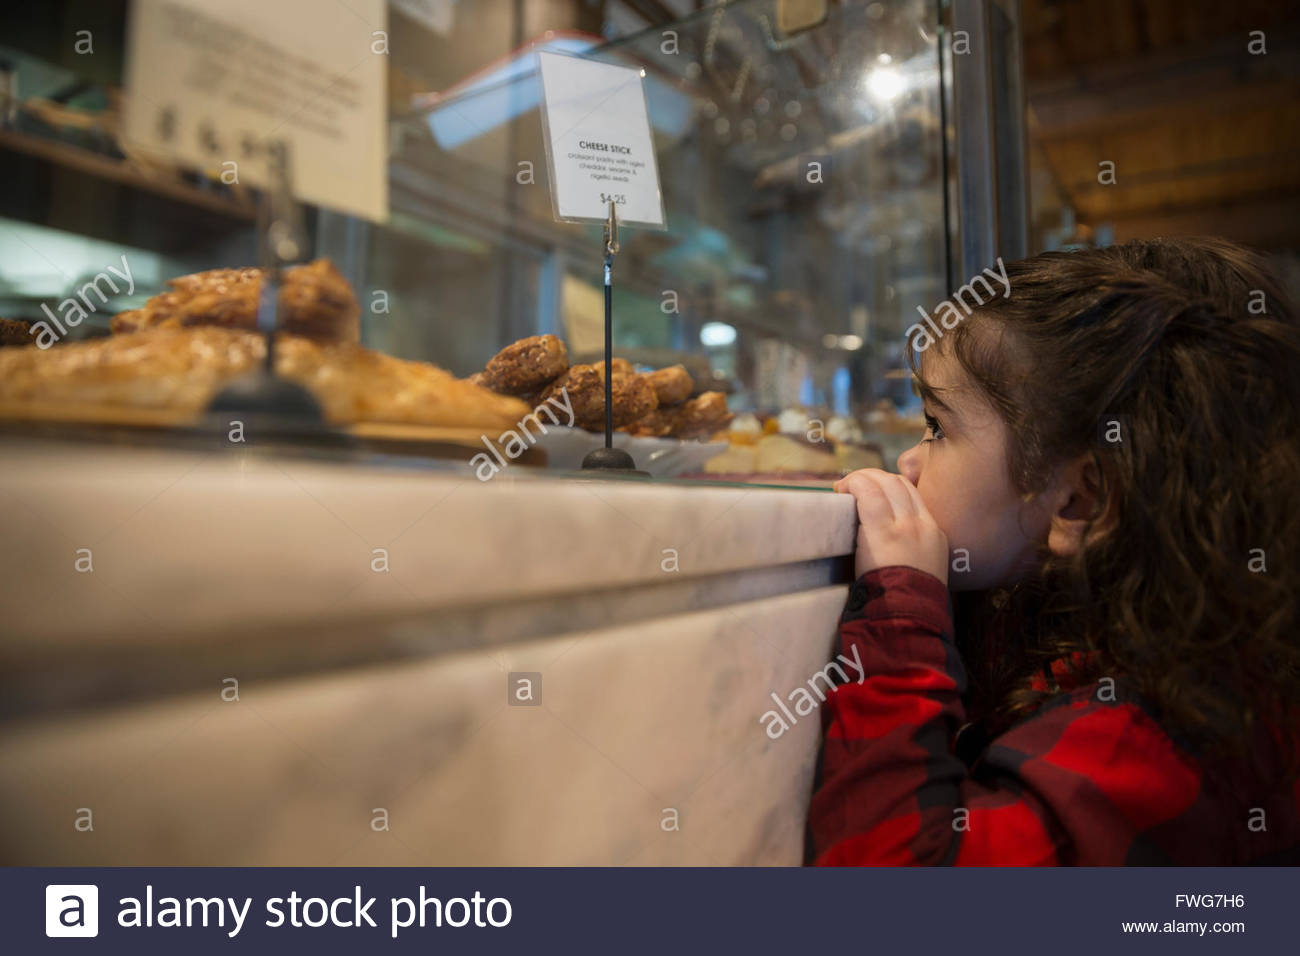 Girl eyeing pastries in bakery display case - Stock Image